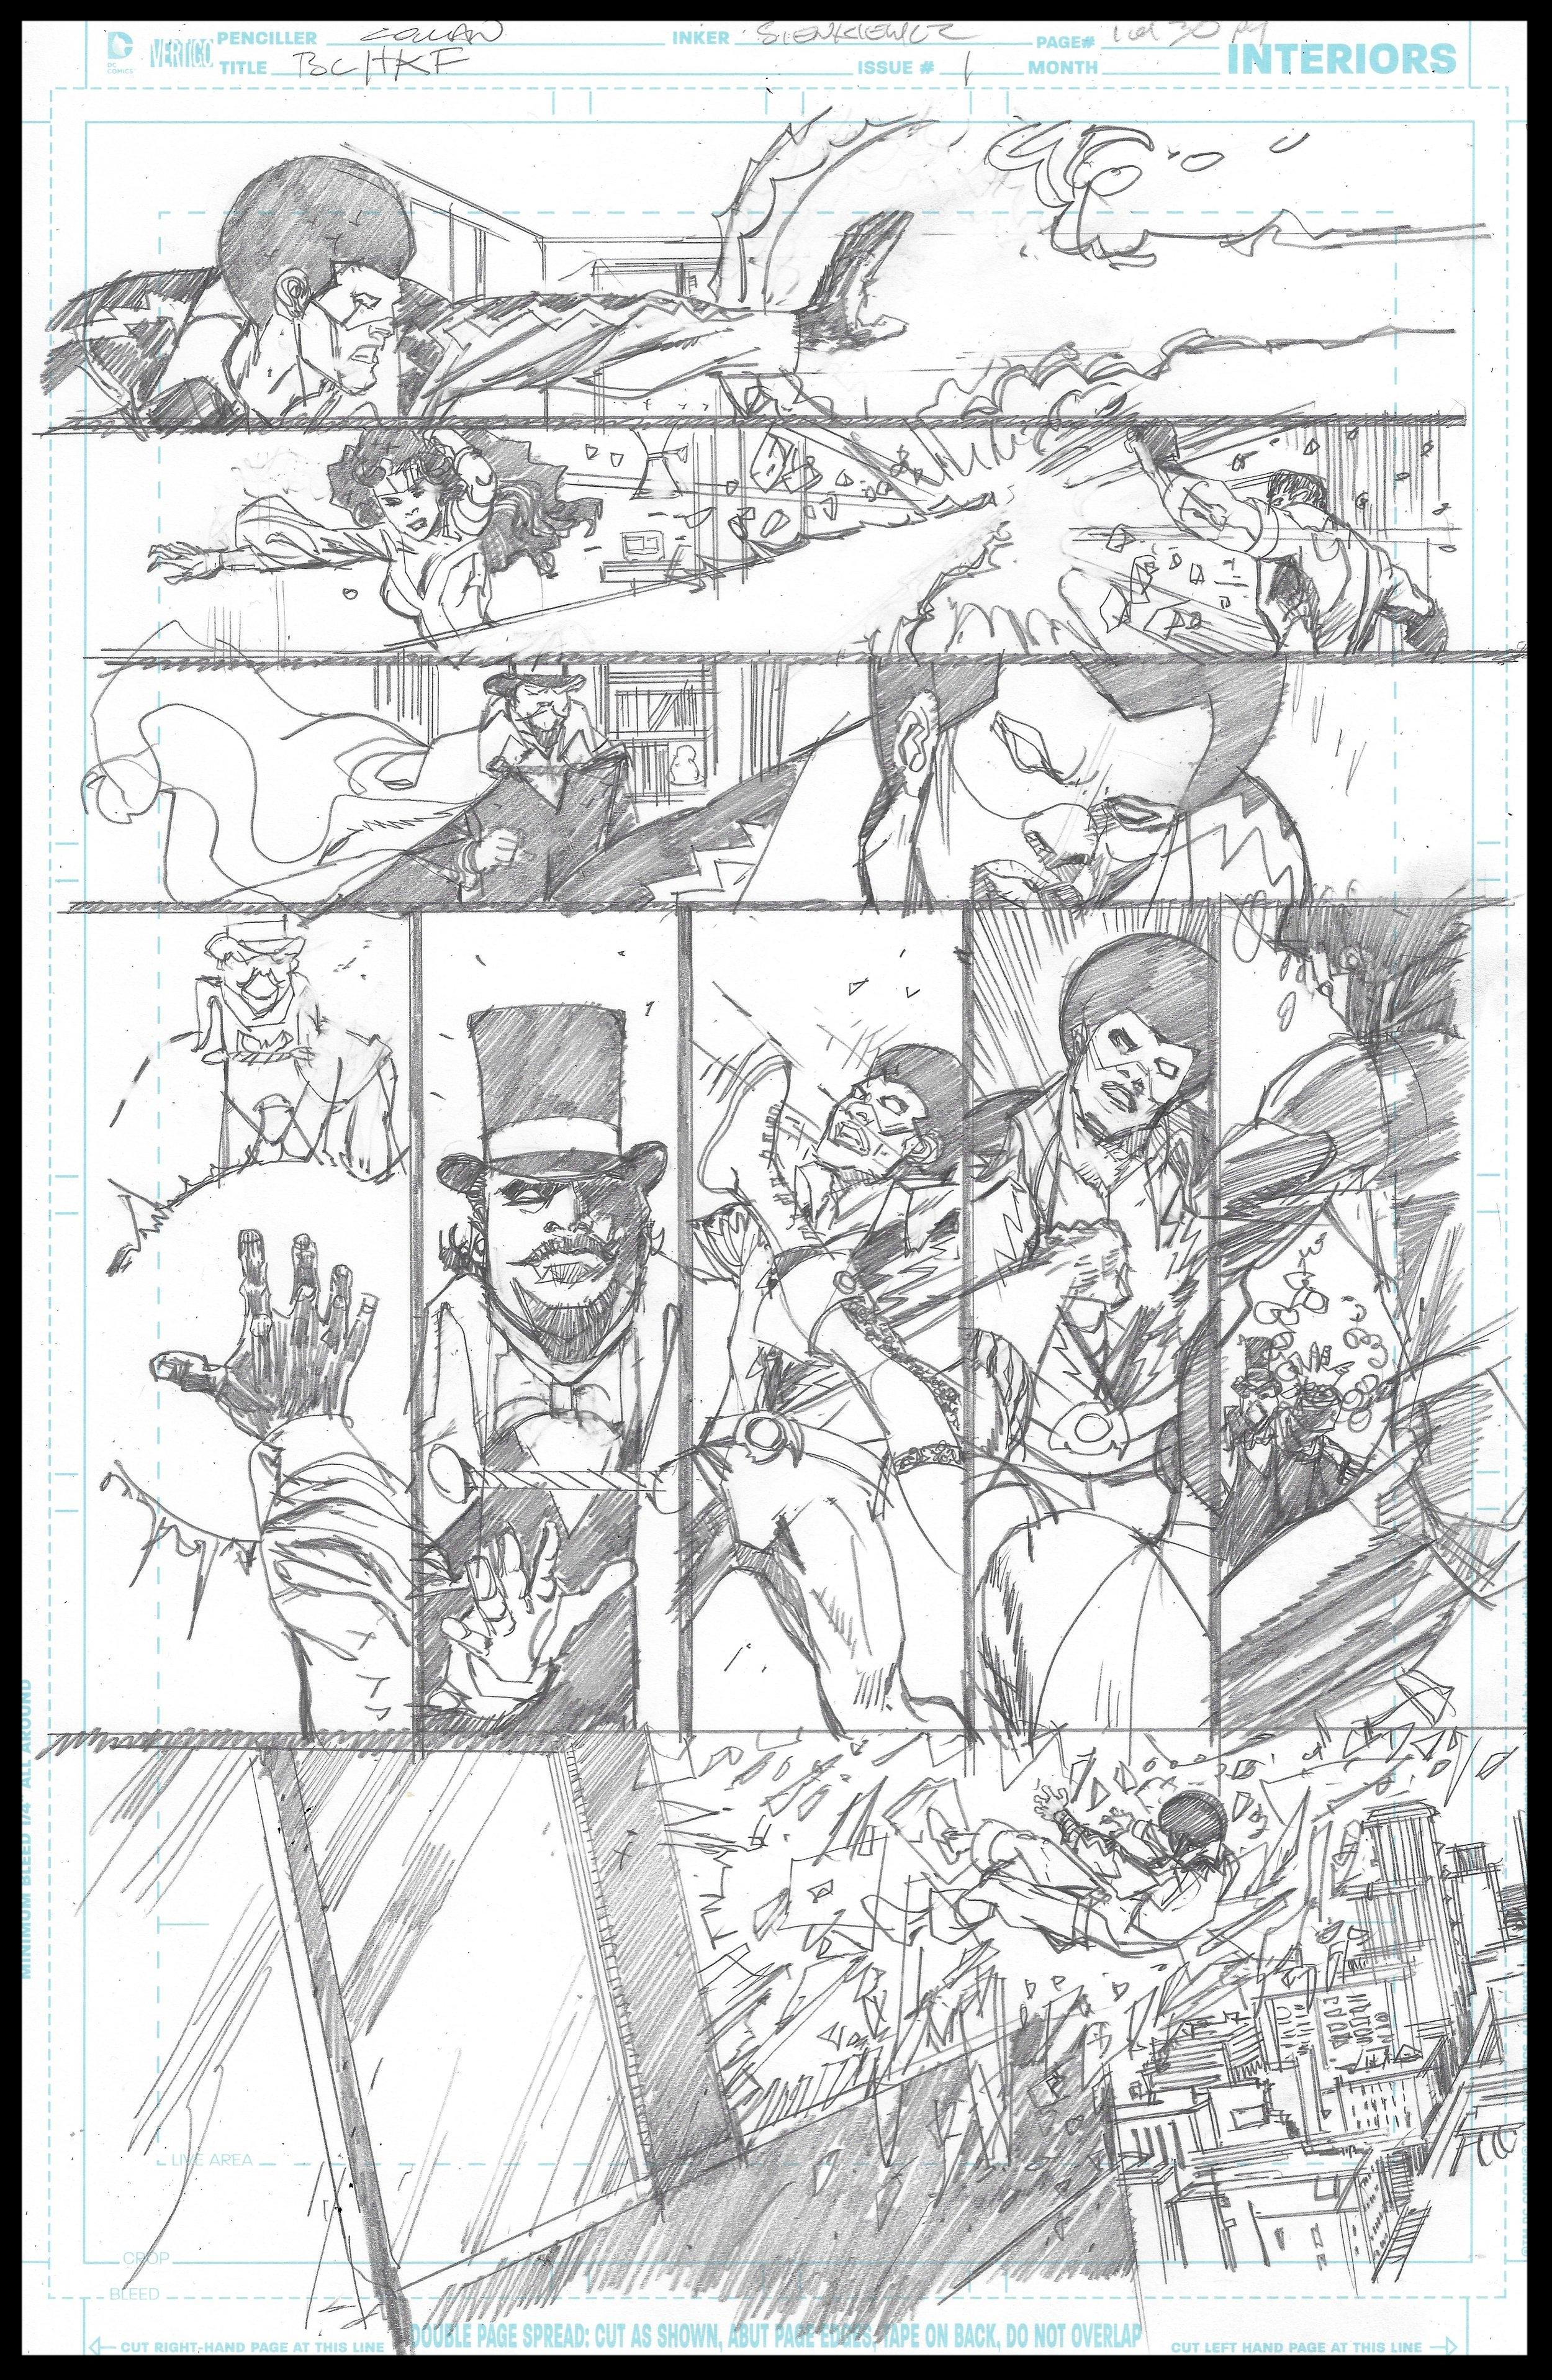 Black Lightning-Hong Kong Phooey #1 - Page 1 - Pencils